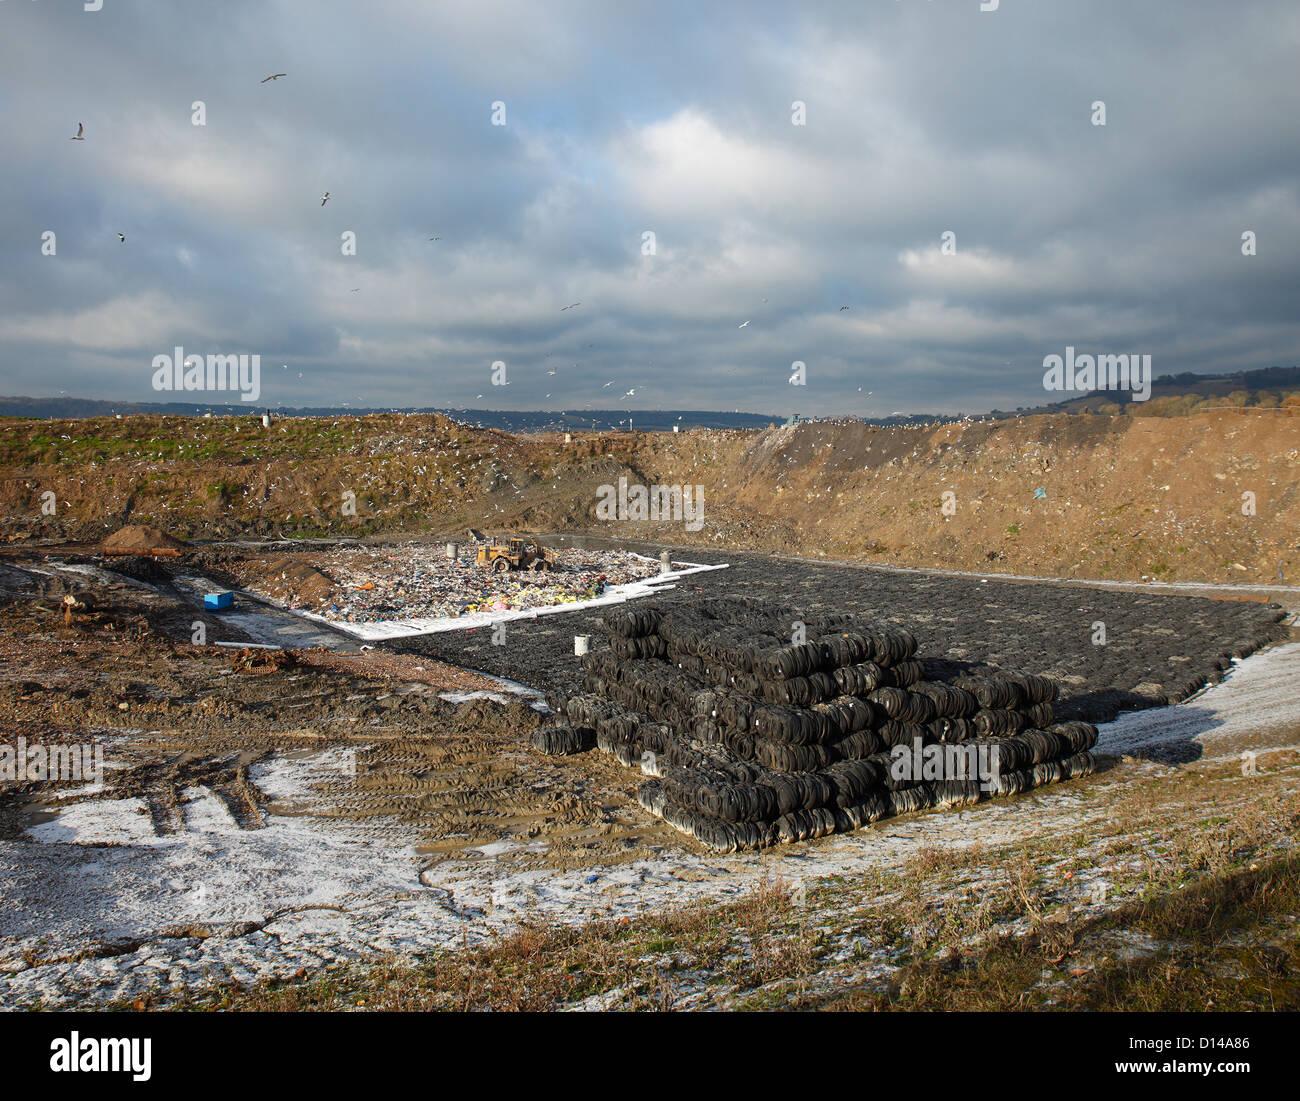 Landfill site at Greatness, Sevenoaks. - Stock Image